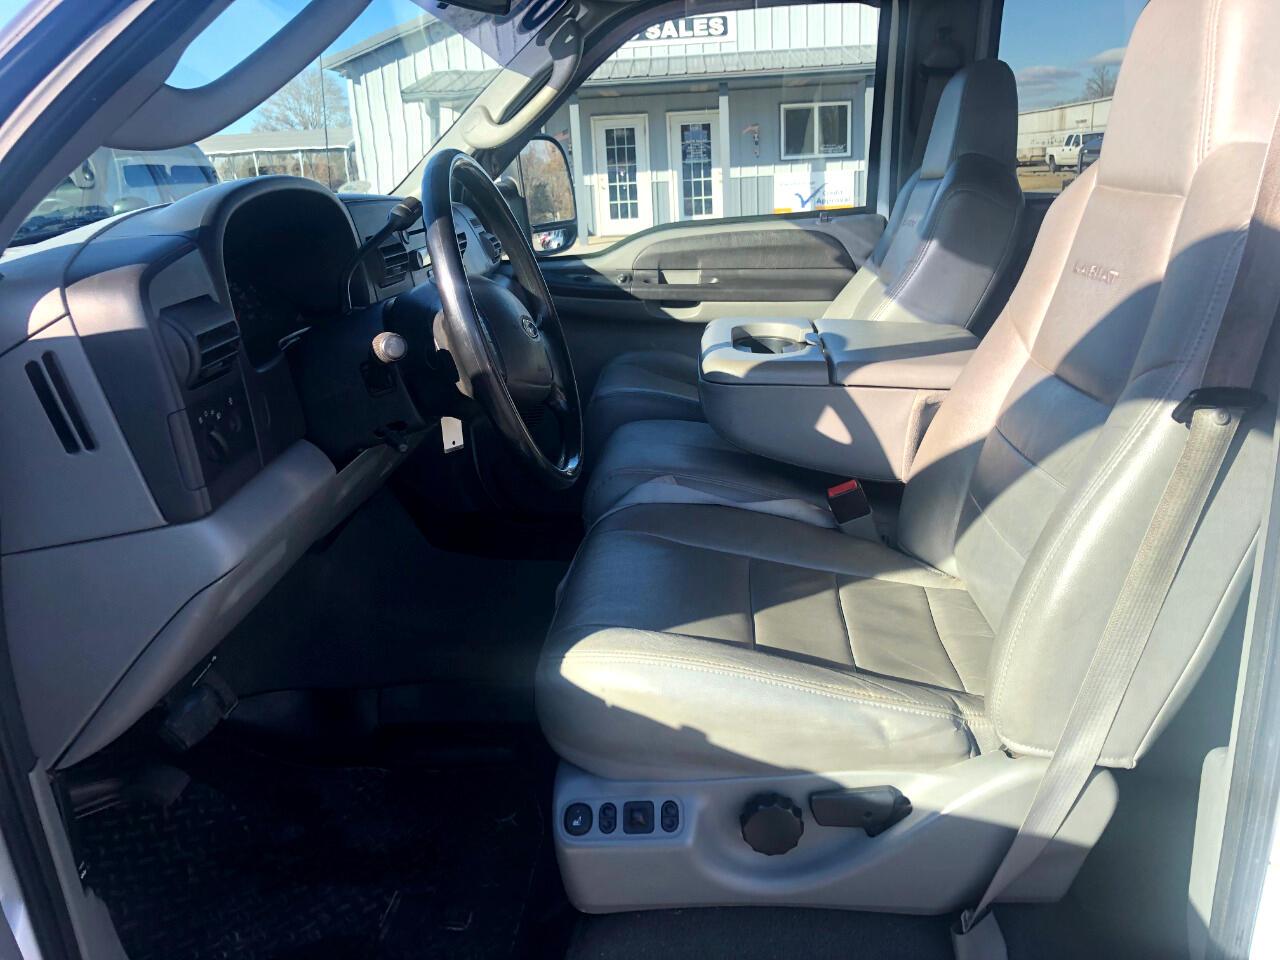 2006 Ford Super Duty F-250 Crew Cab Lariat 4WD